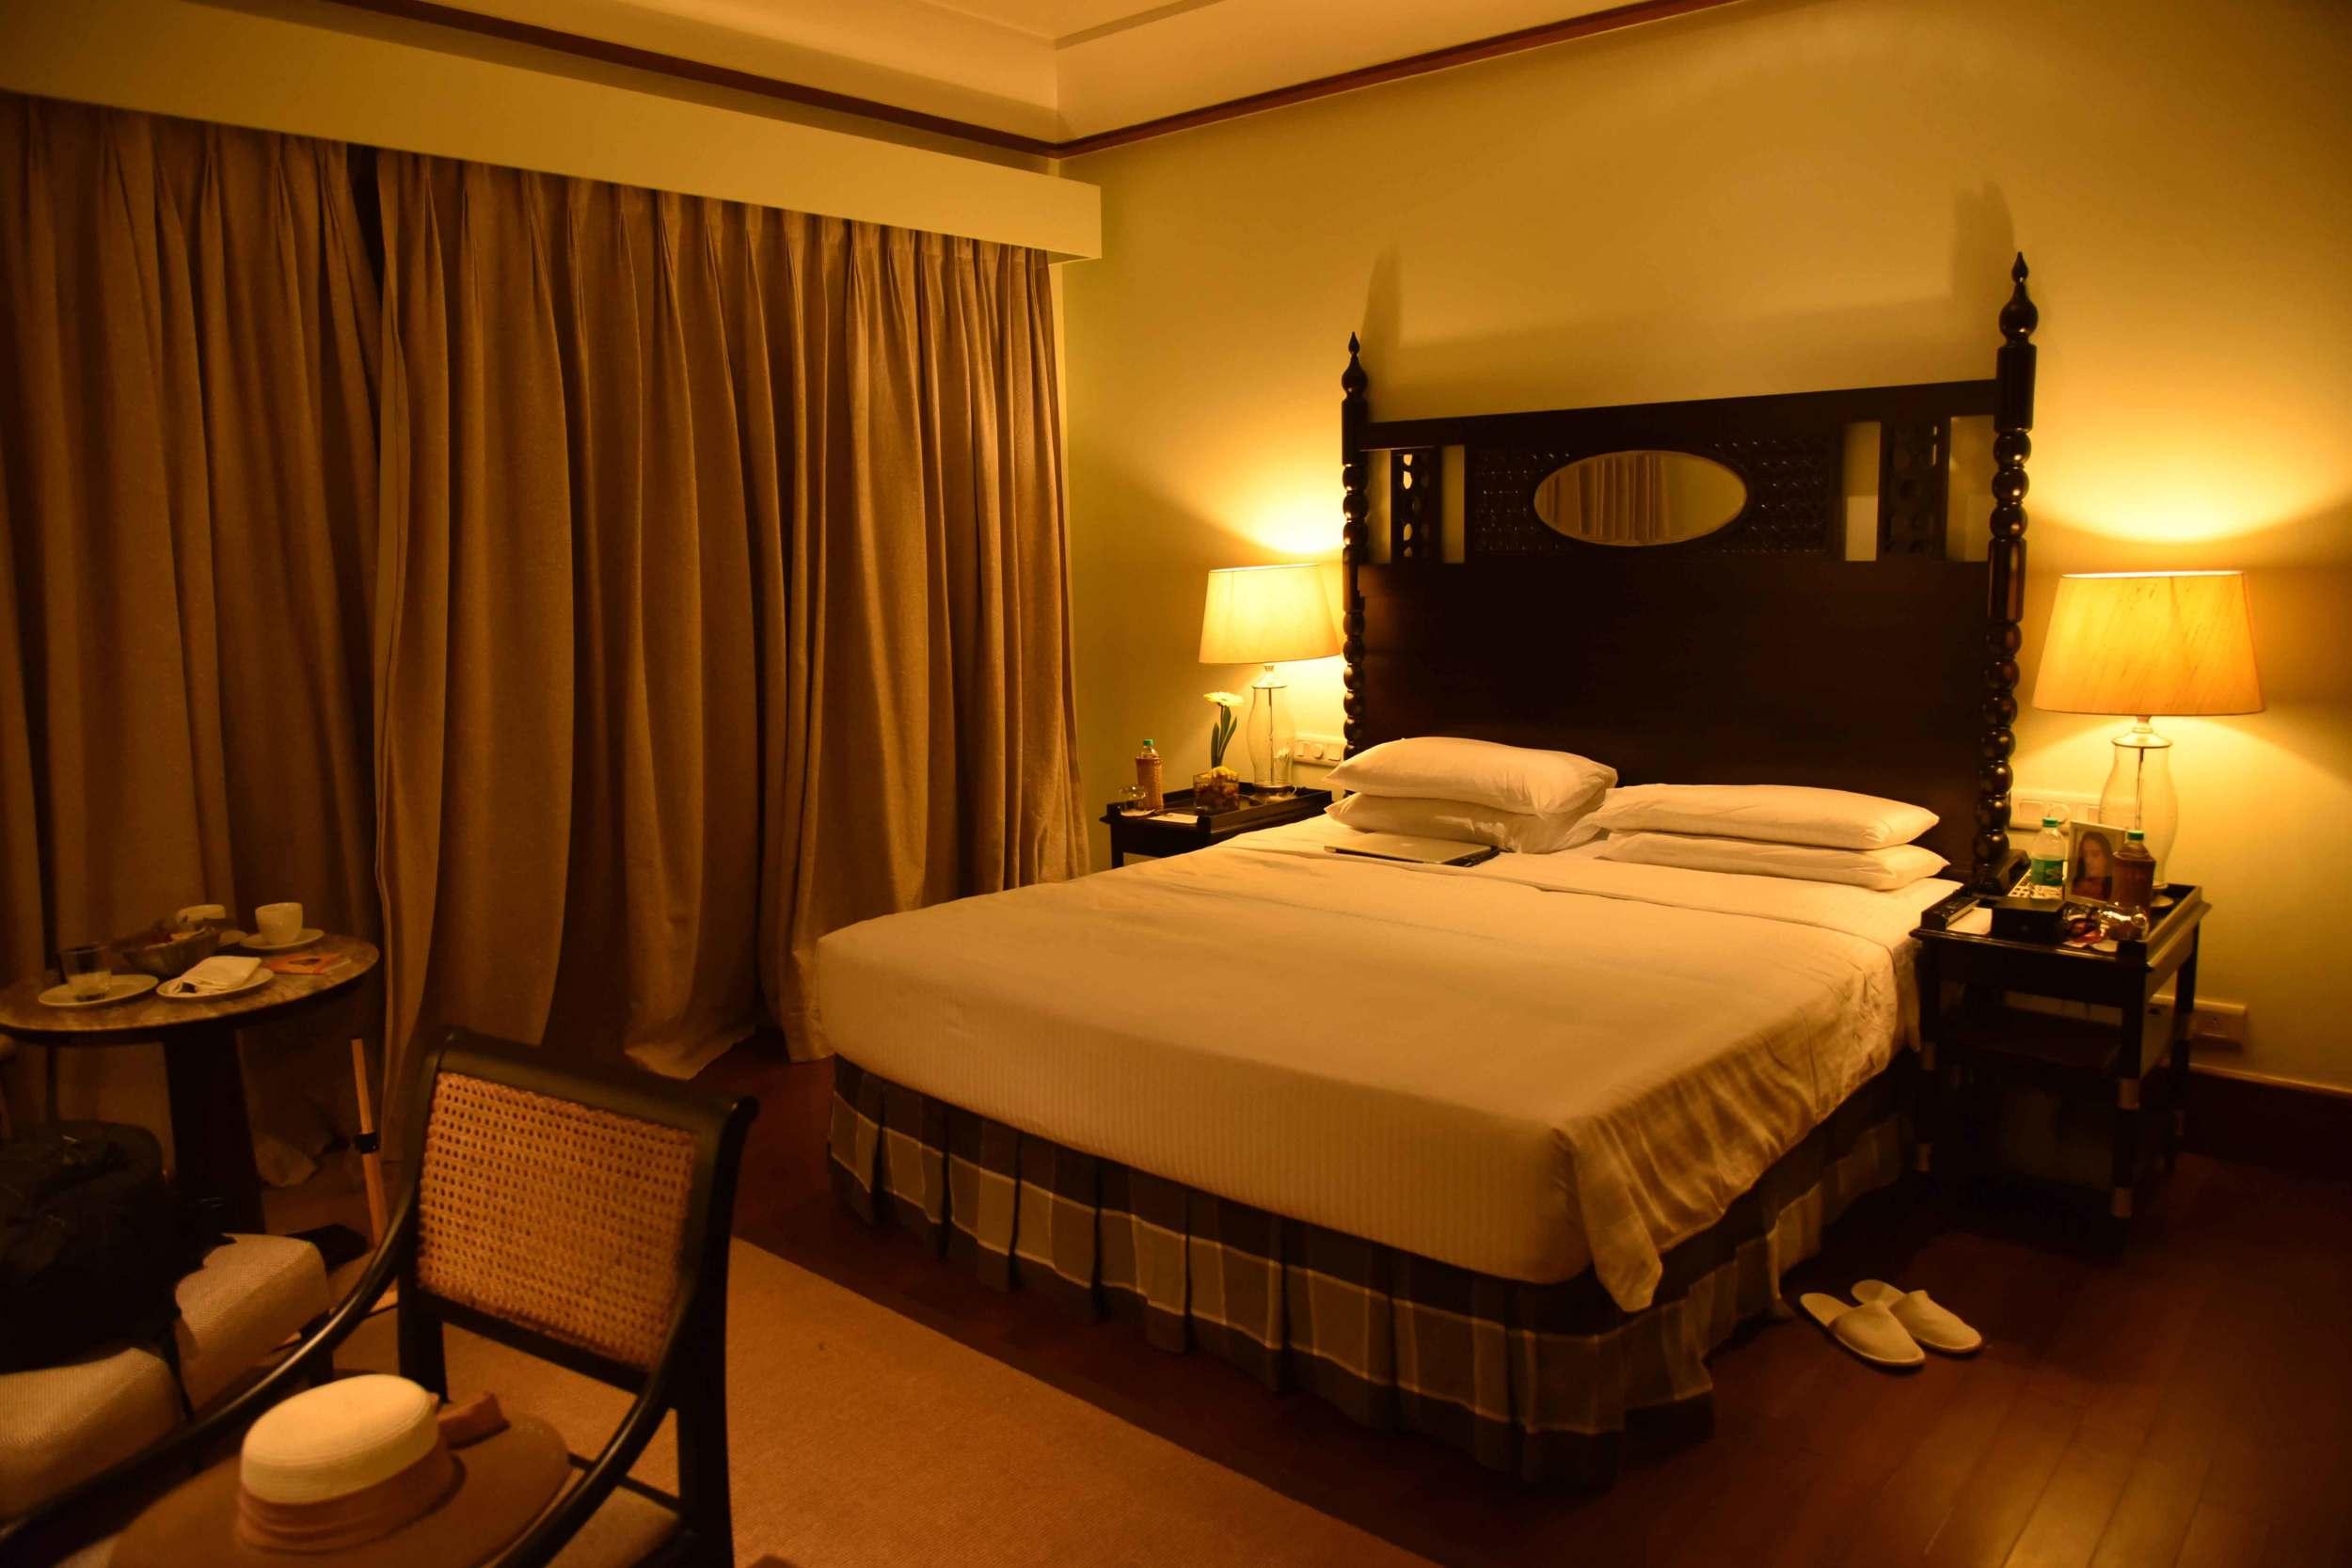 Guest room,Park Hyatt, Goa, India, beach resort, luxury spa resort. Image©thingstodot.com